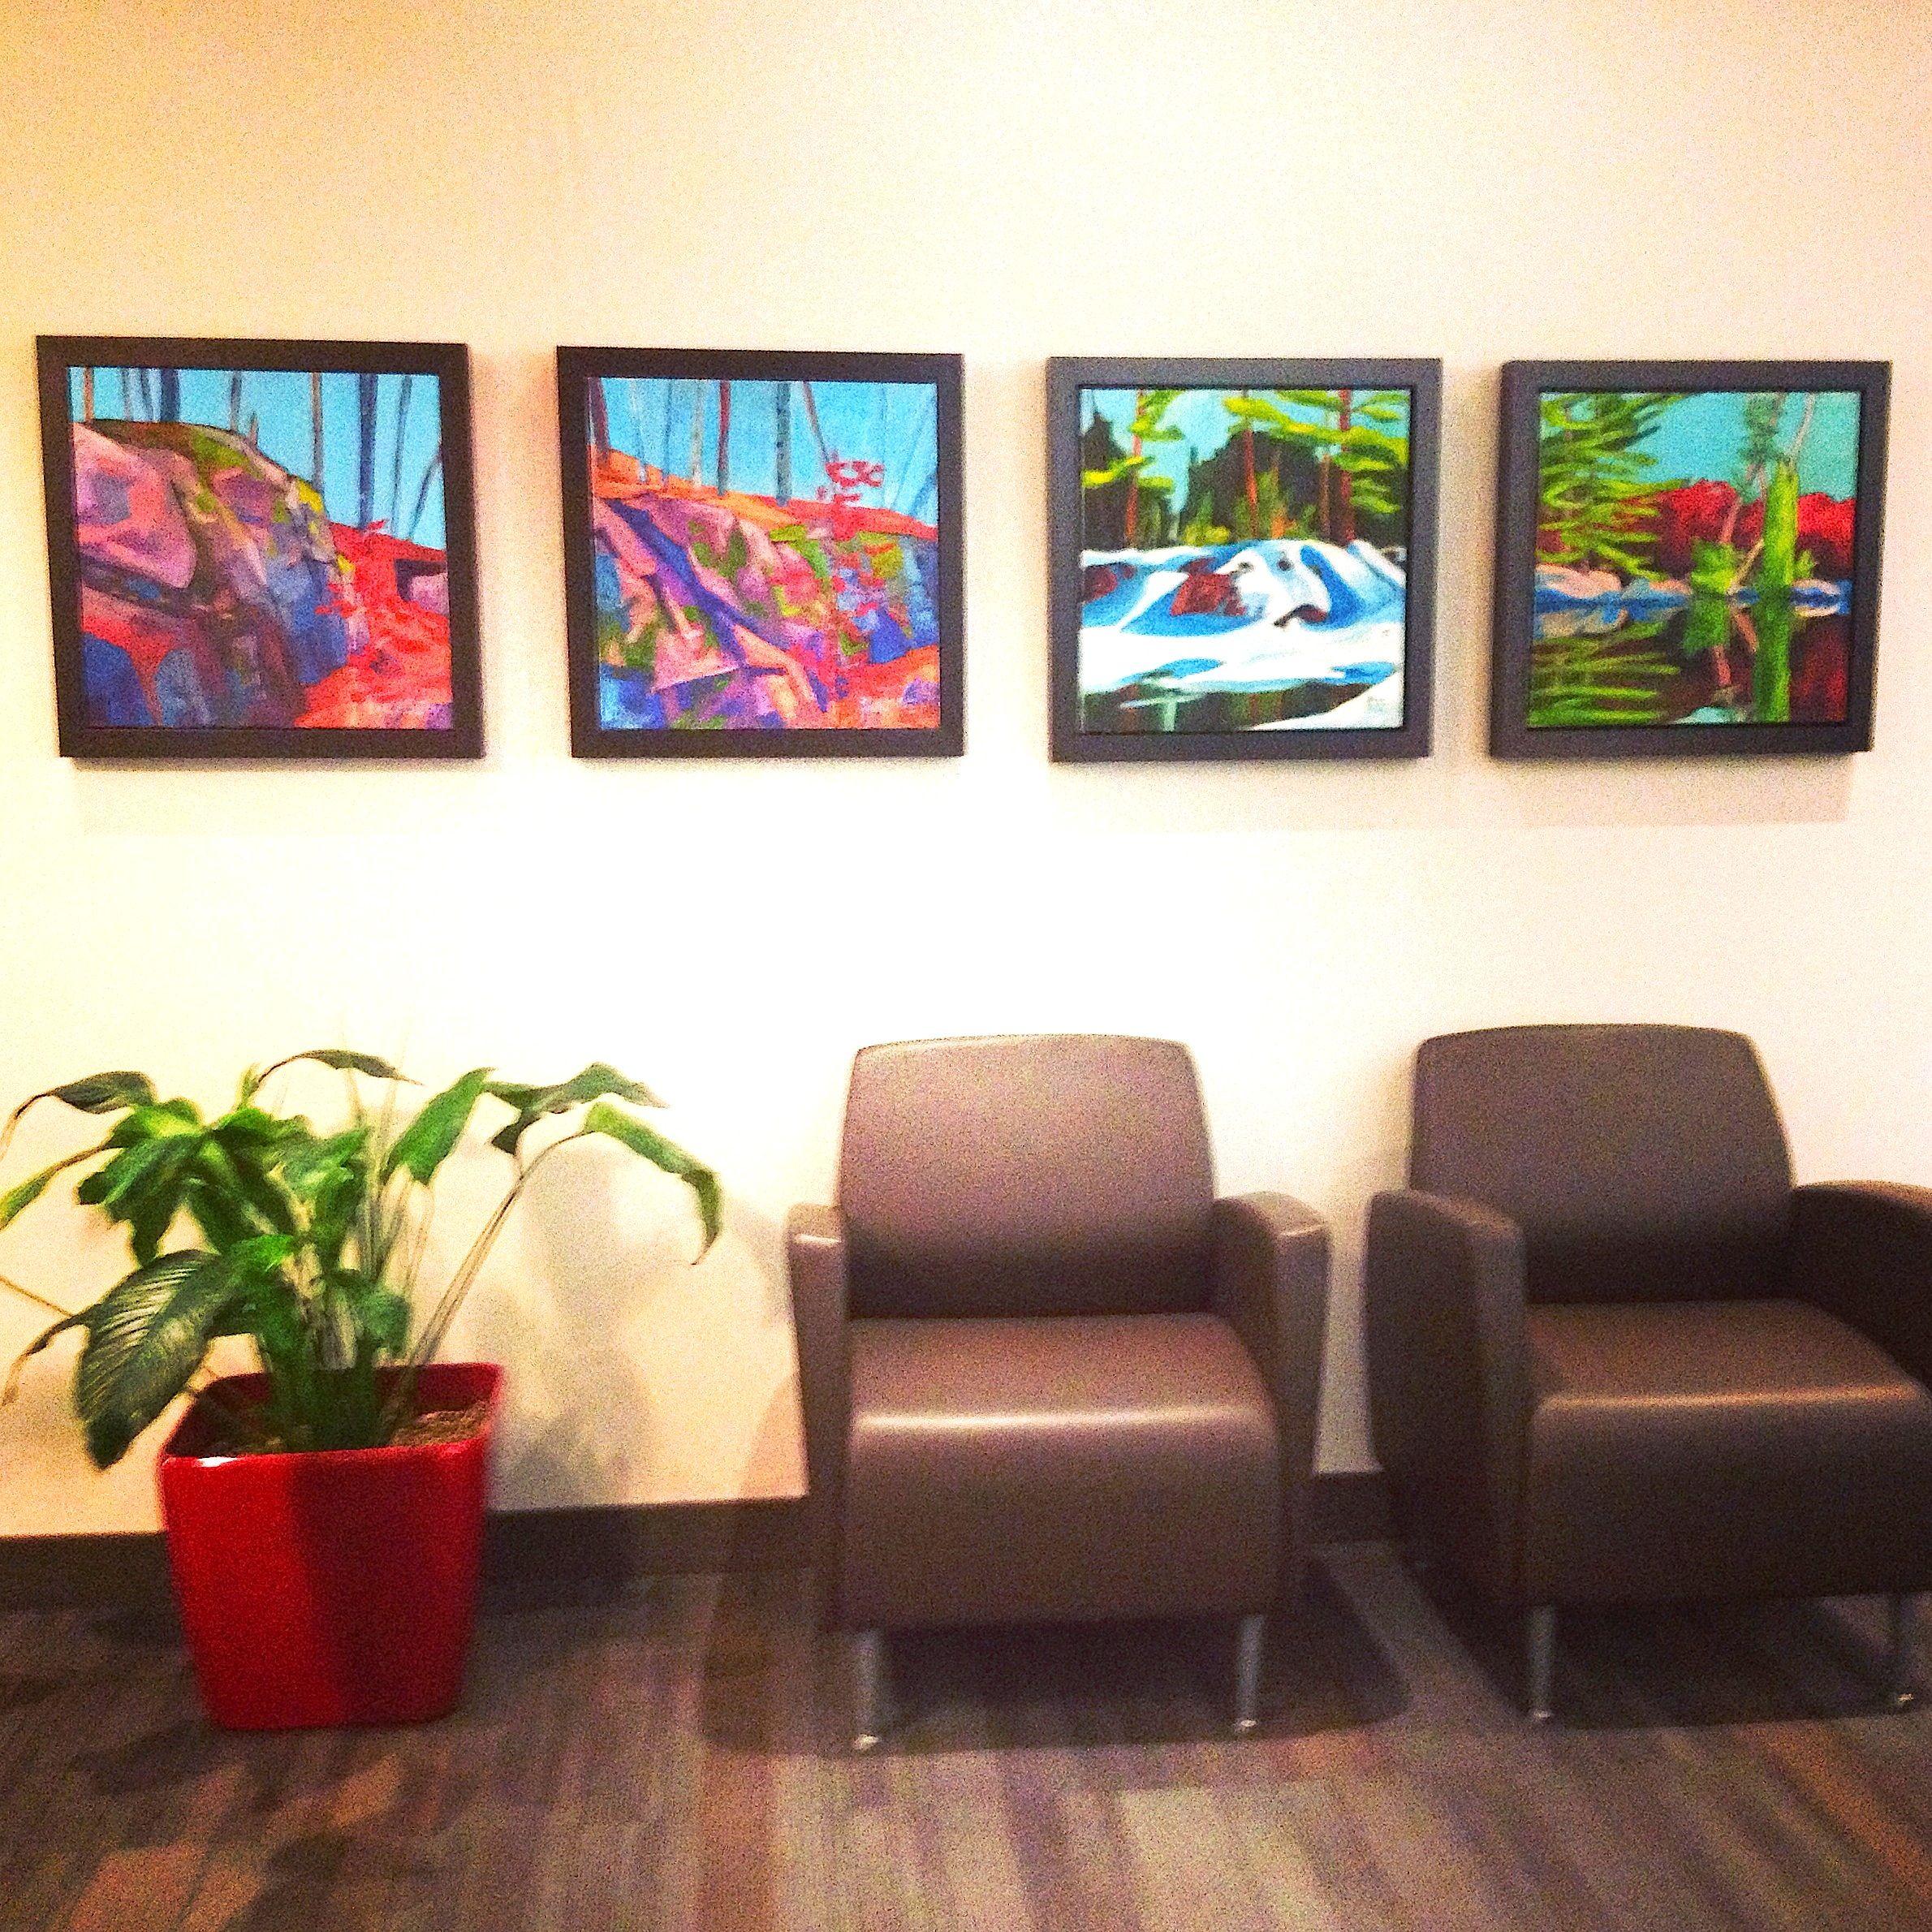 Office lobby, artwork by David Casey. Ottawa artist, Canadian artist, landscape painter.